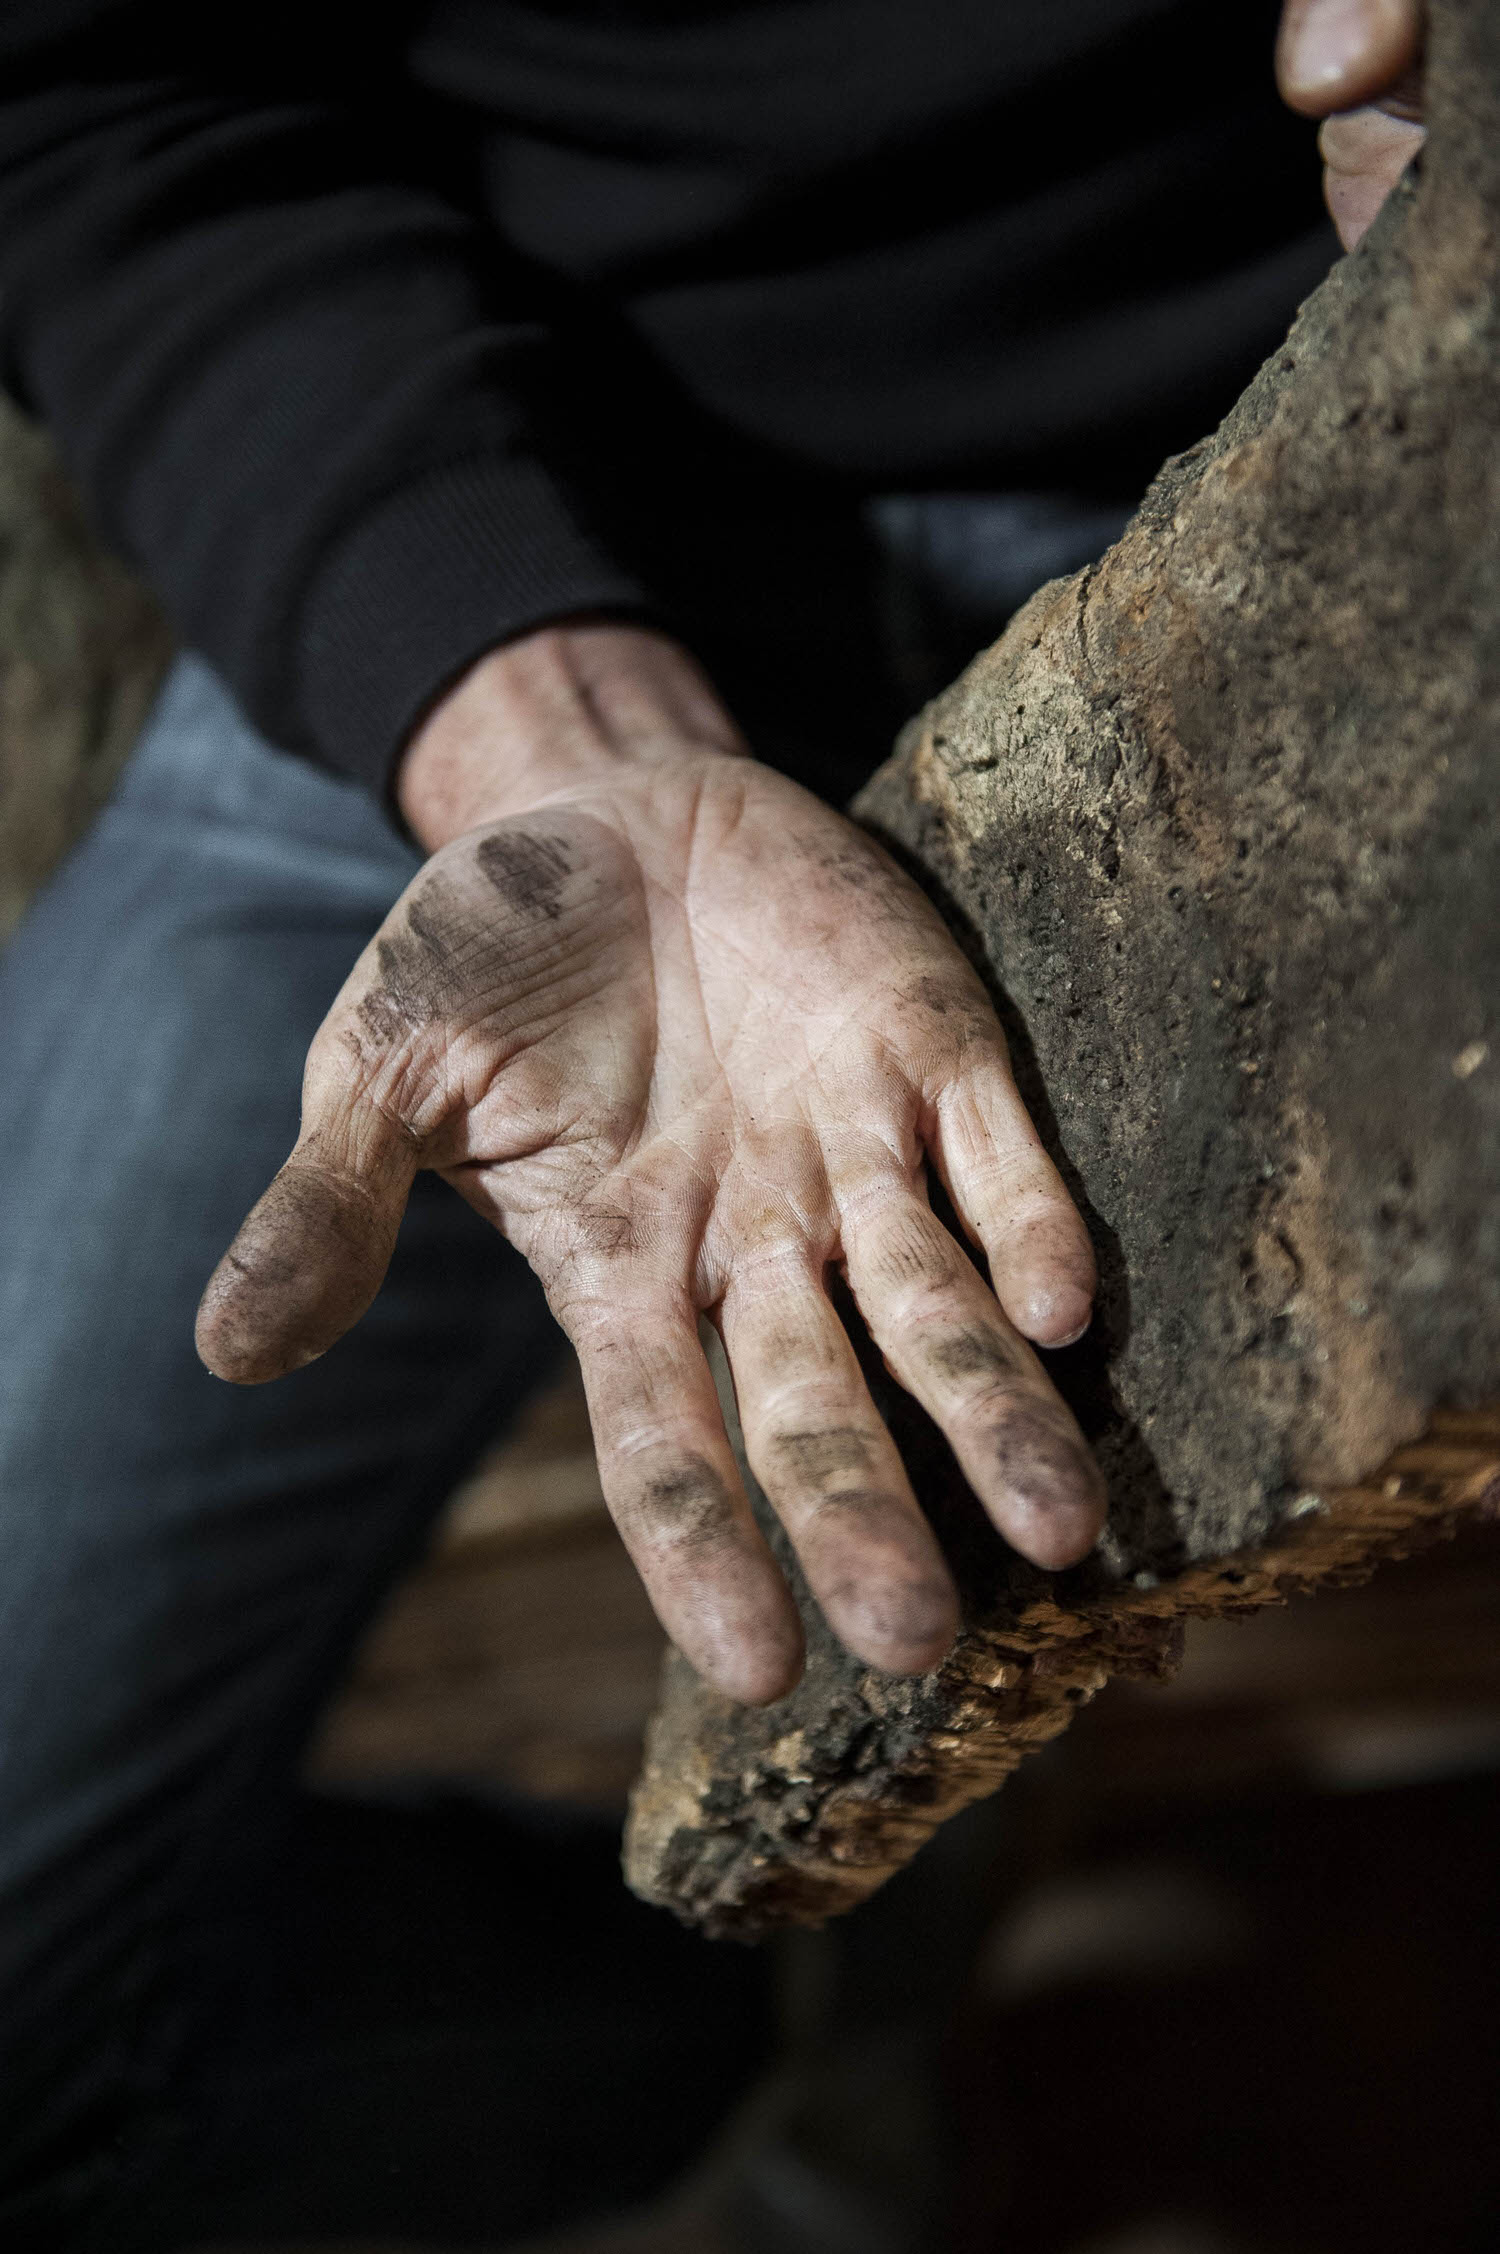 Noe Duchaufour Lawrance Burnt Cork Exploration Made In Situ Photo Filipa Alves Yellowtrace 23